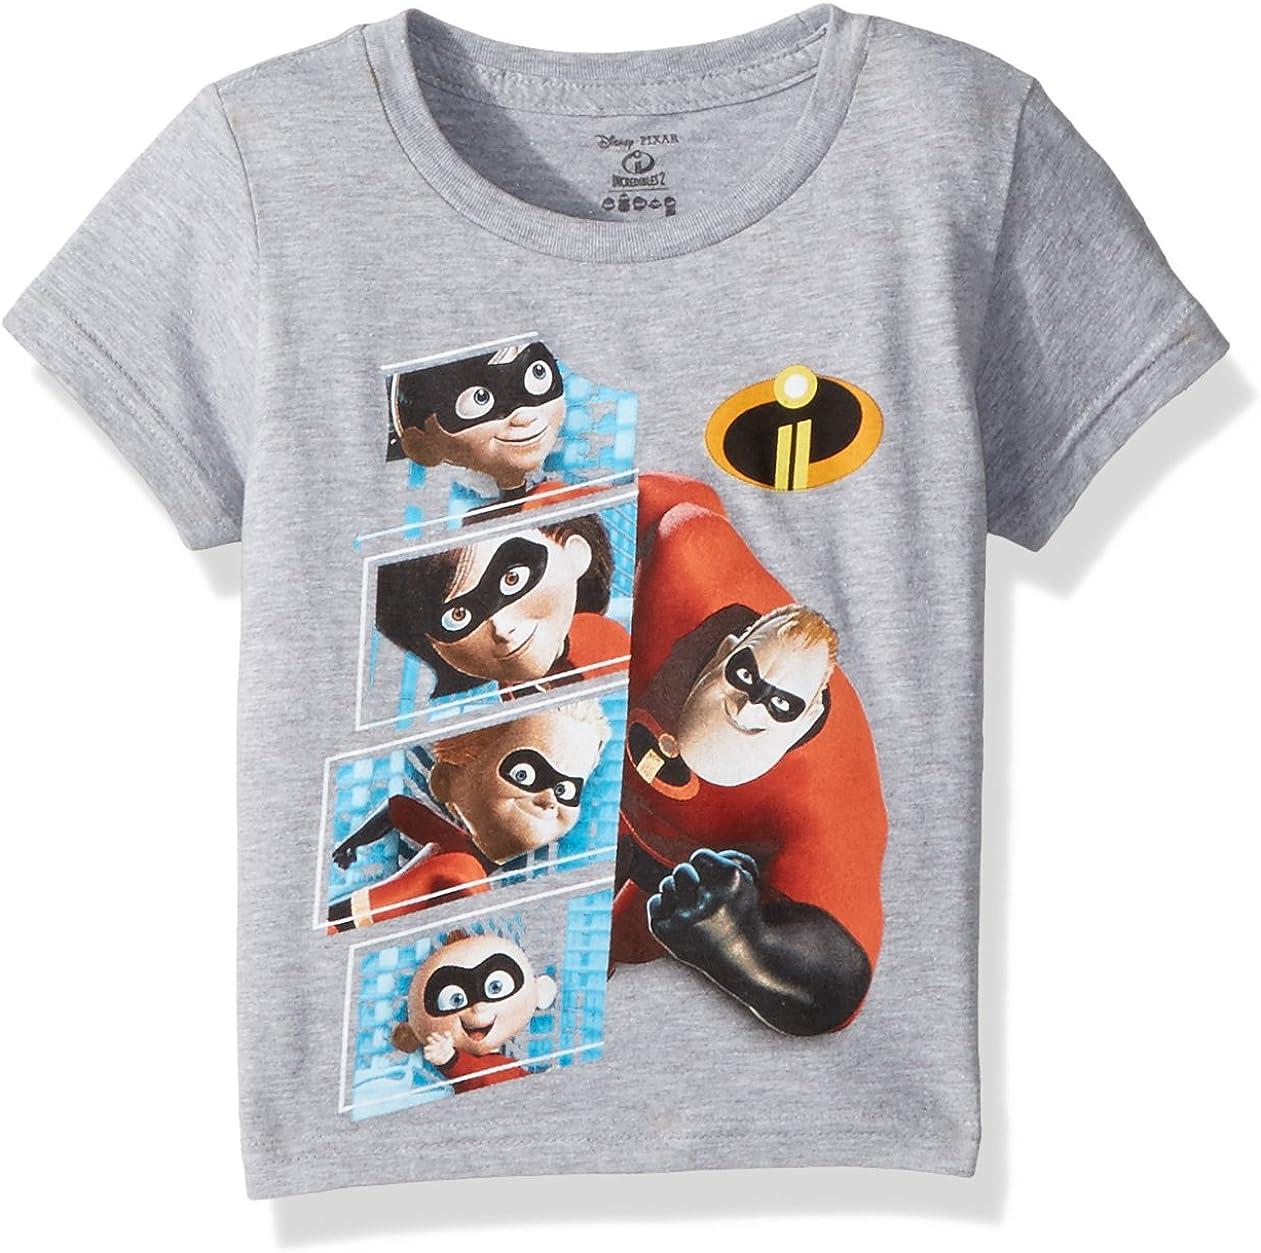 Disney Kids The Incredibles 2 Character Panel Short Sleeve T-Shirt